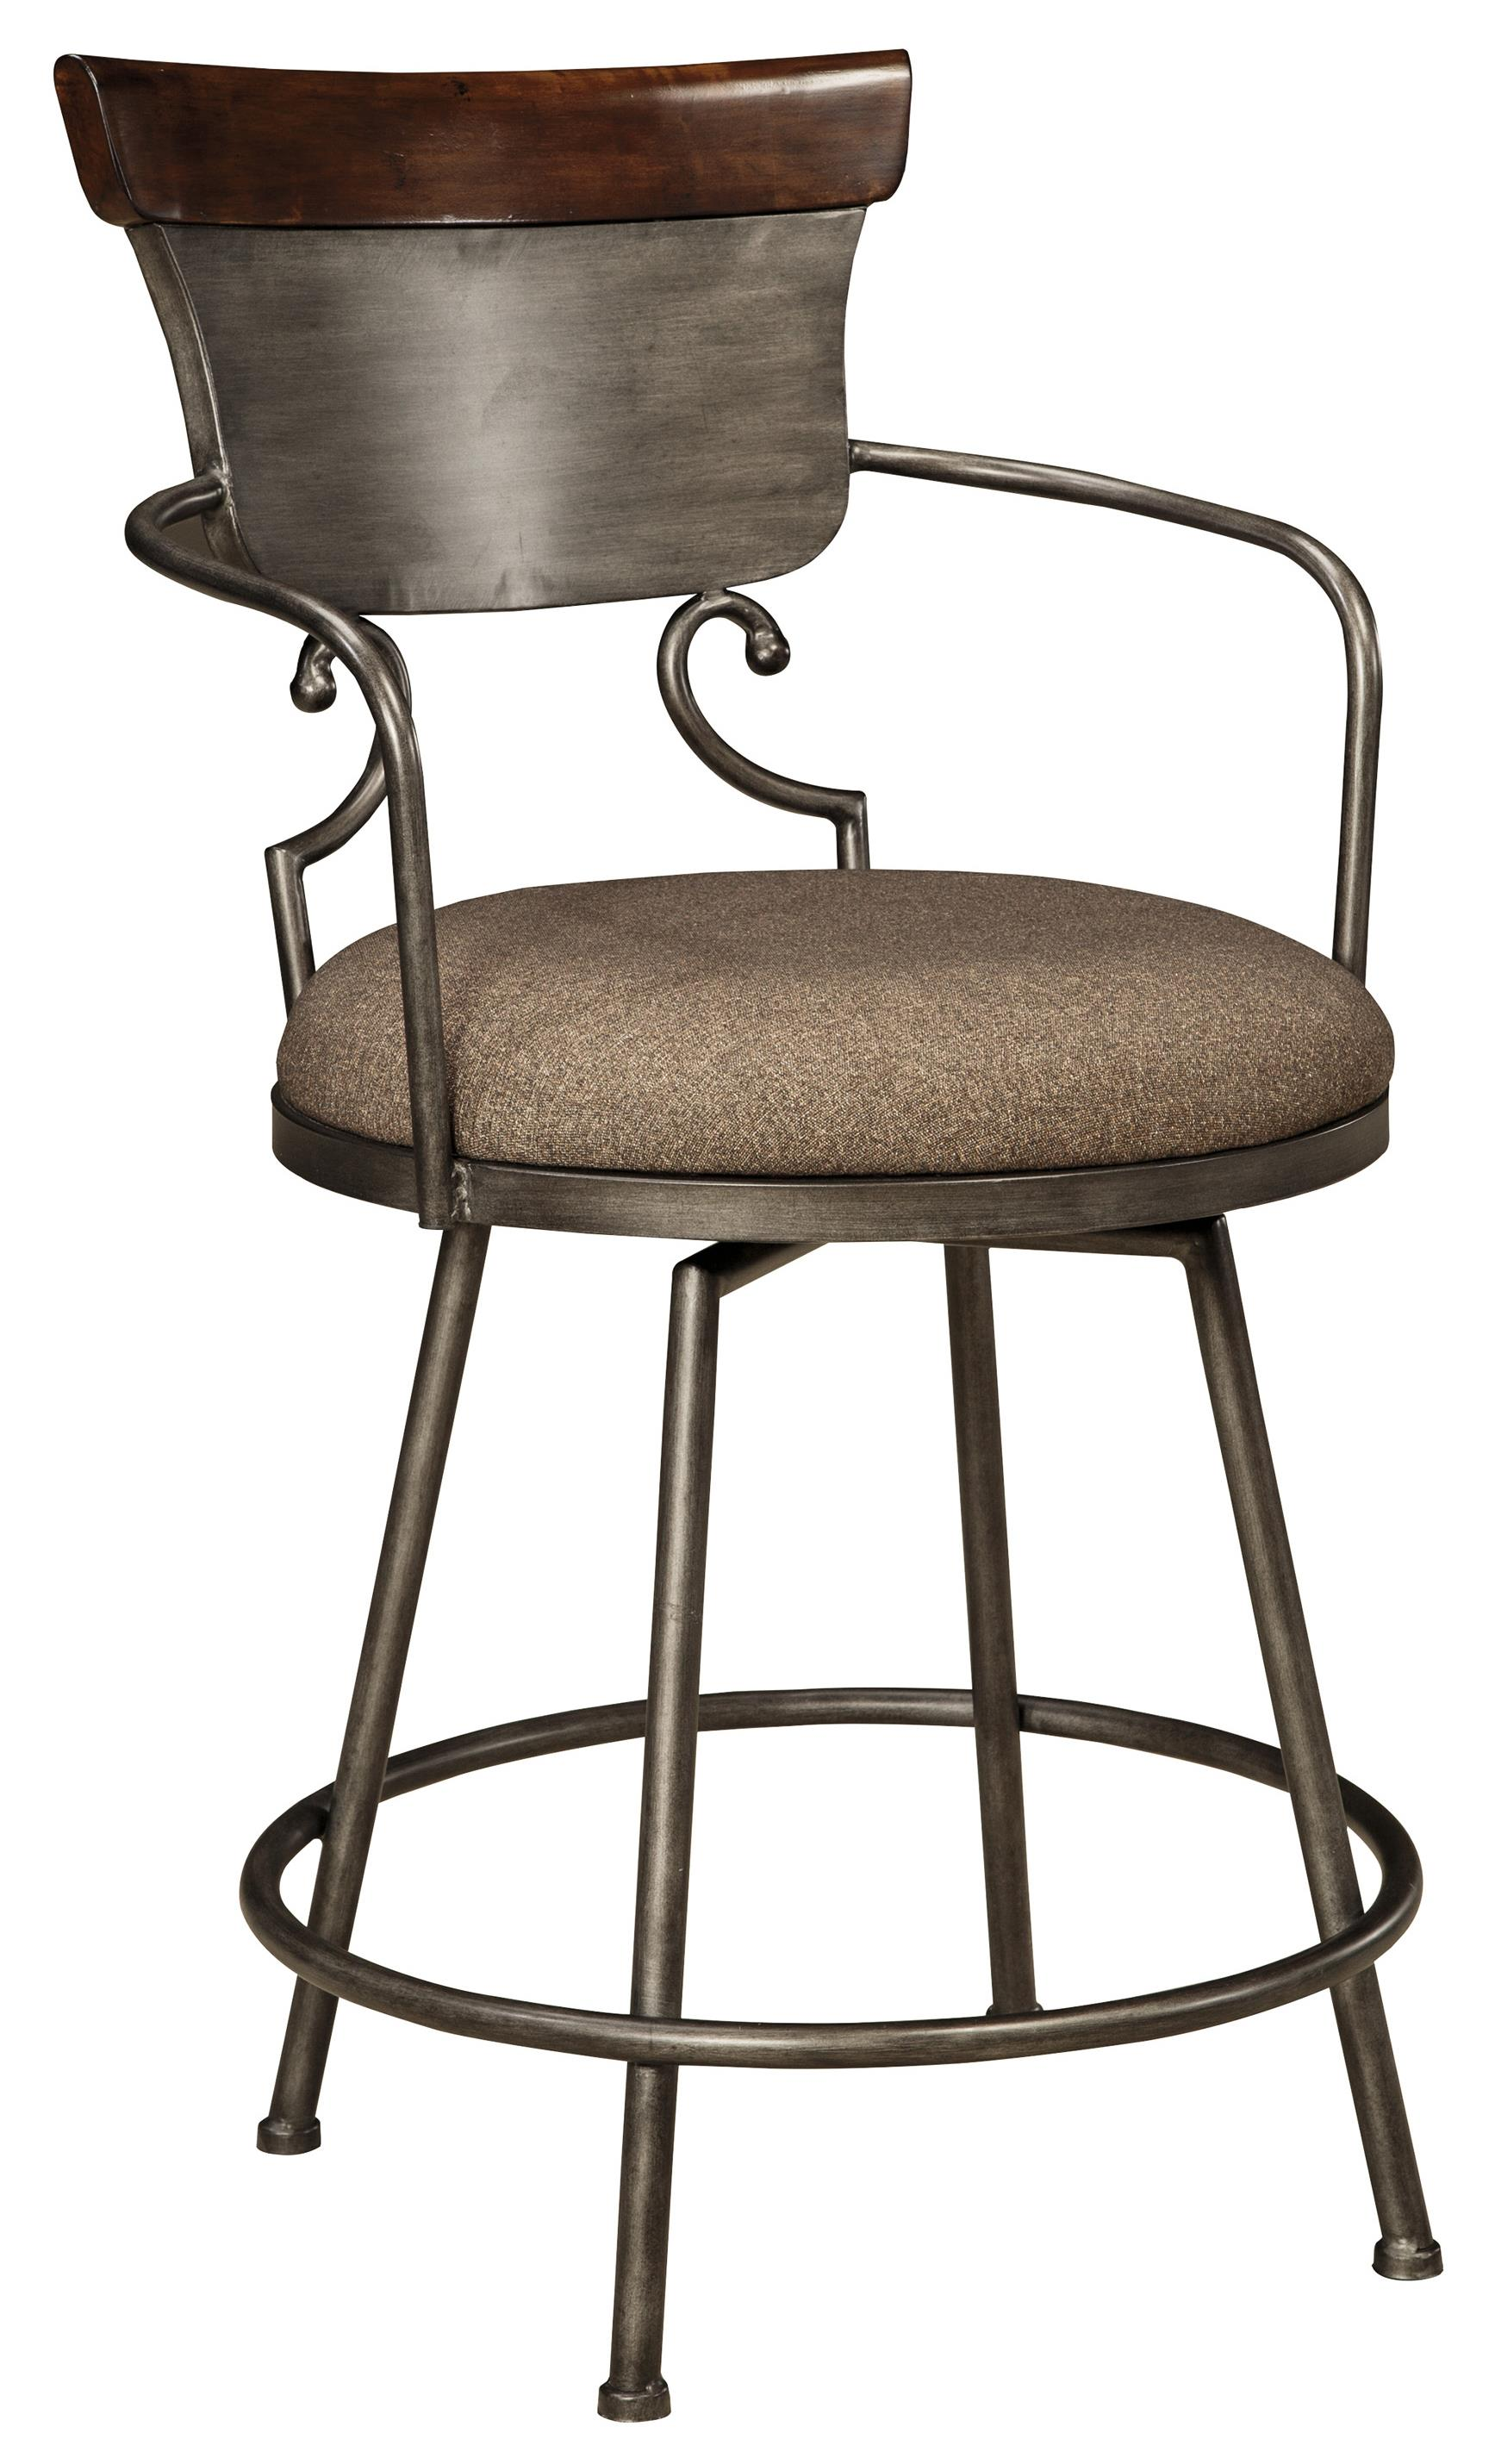 design bar chairs desk chair mat ashley signature moriann upholstered barstool